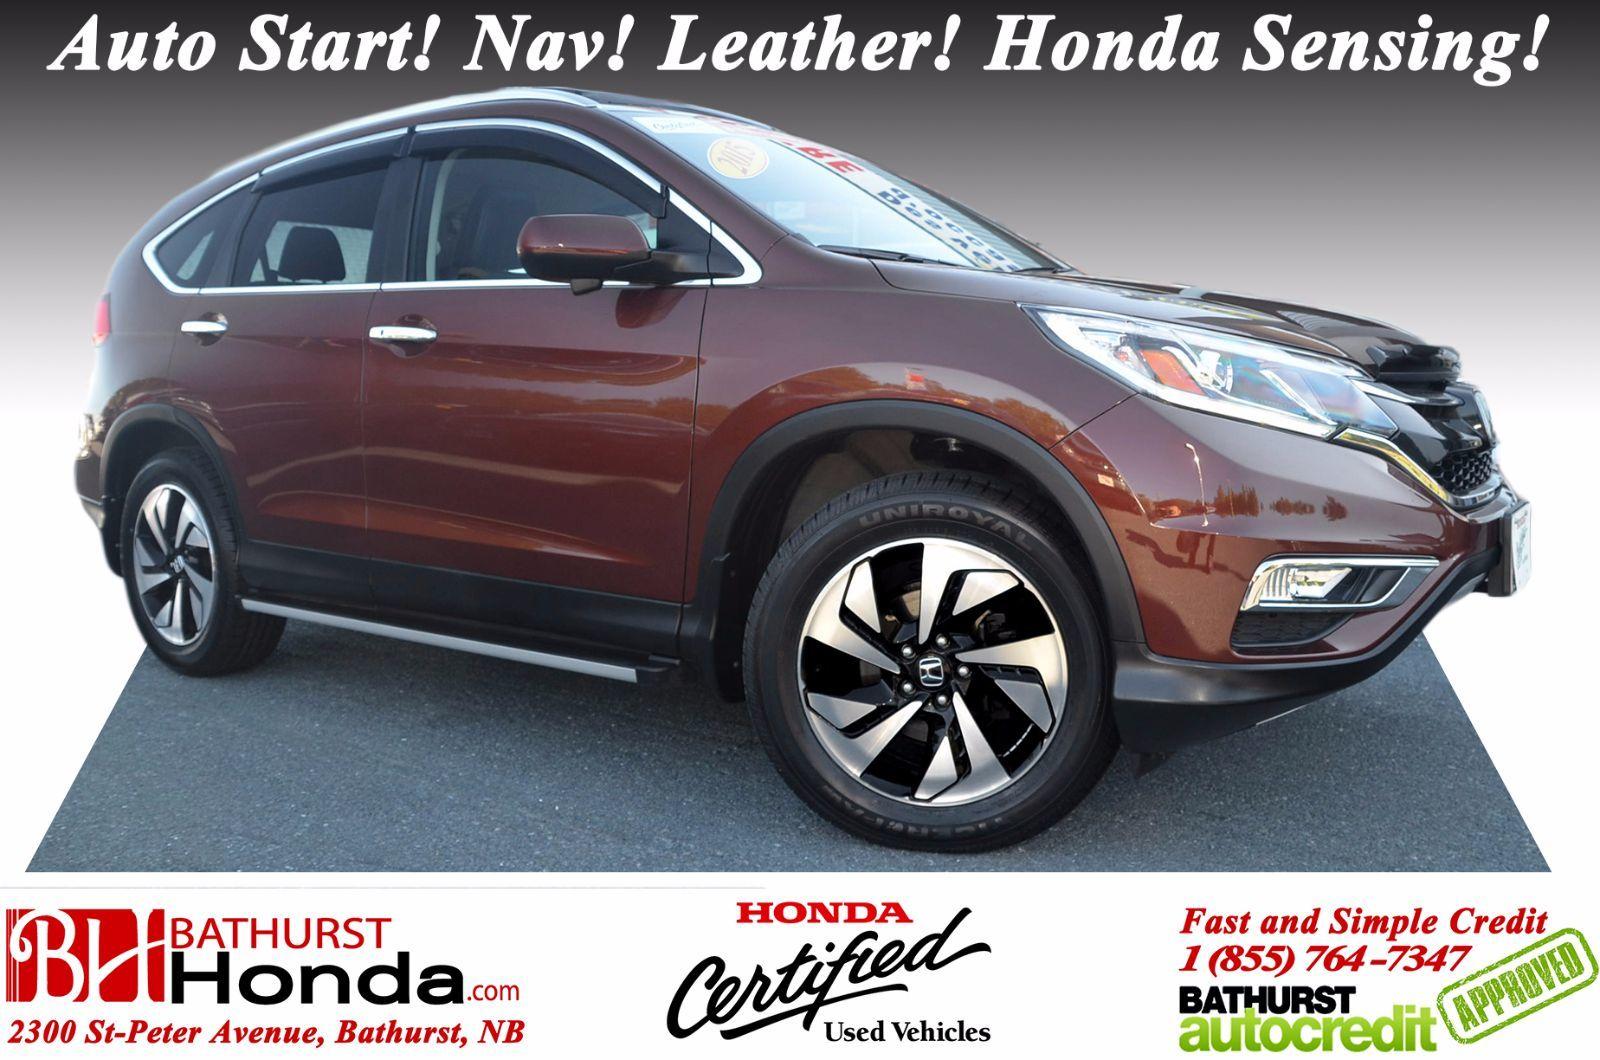 New honda dealer myrtle beach sc serving georgetown home for Honda dealership myrtle beach sc